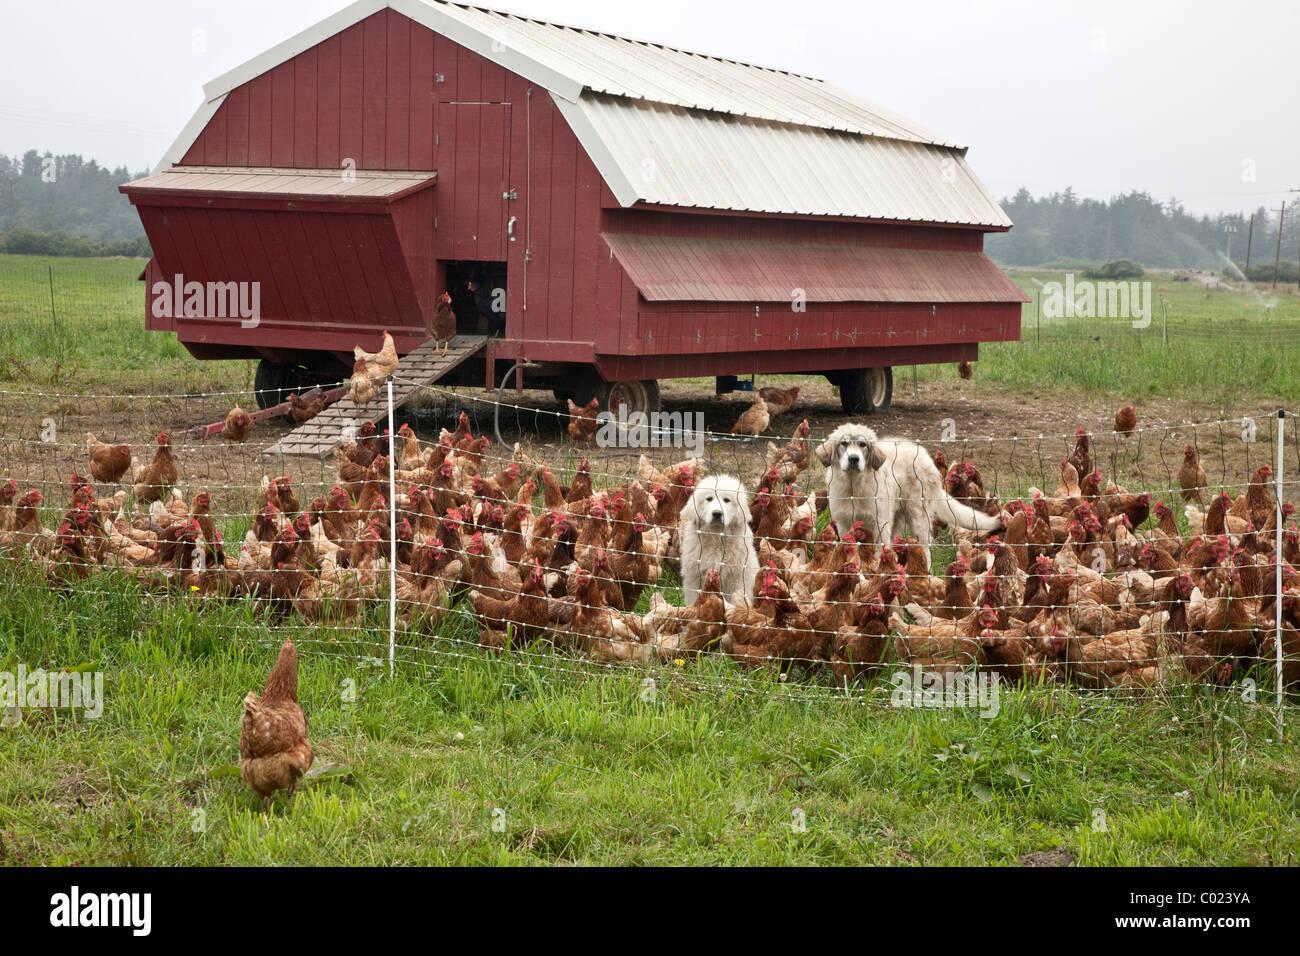 Free Range Chickens, Portable Housing.